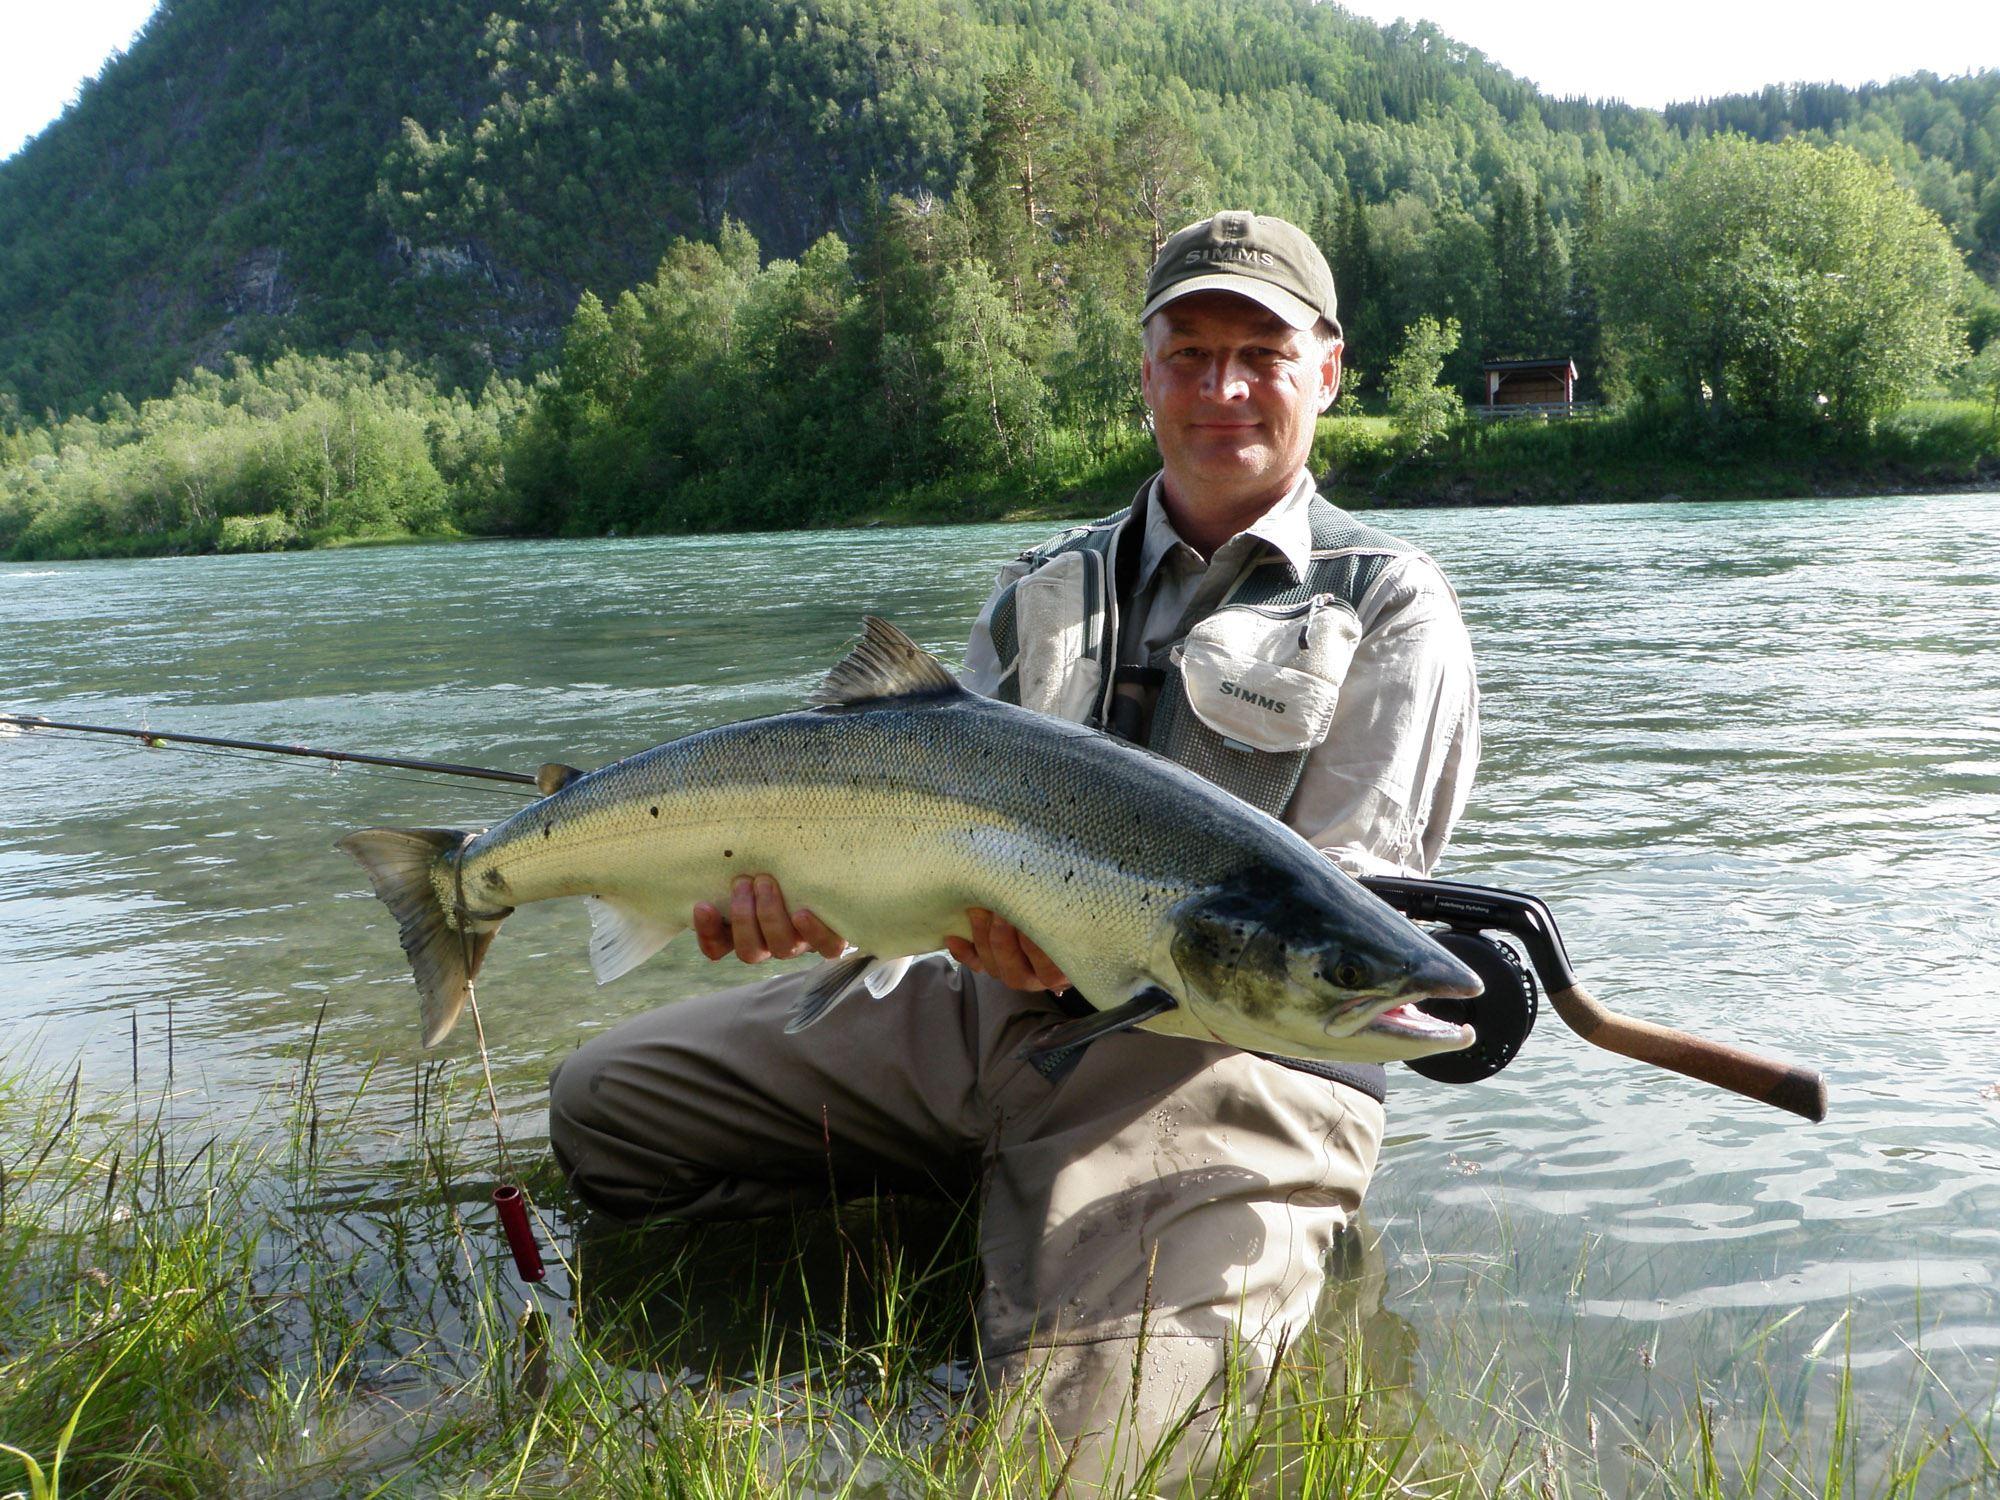 Fiske med Franzen gjestgiveri